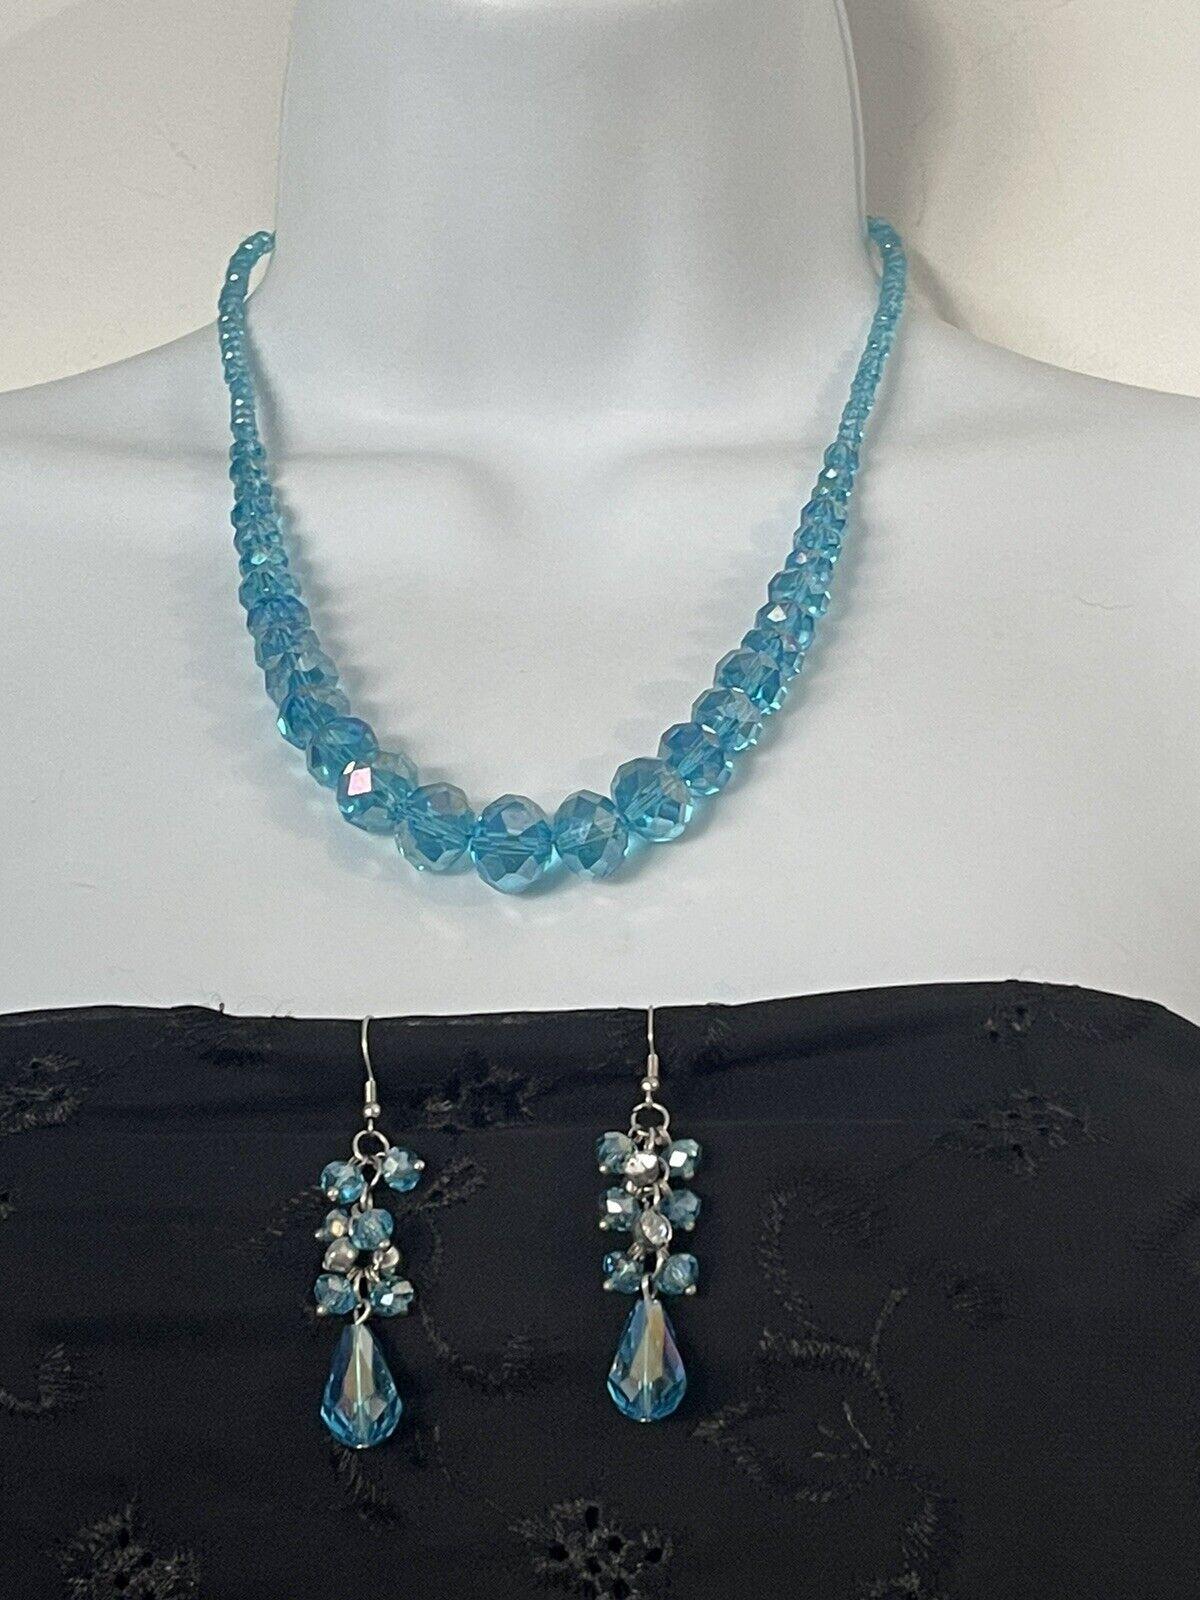 Silver Tone Teal Blue Crystal Diamante Teardrop Pendant Necklace Earrings Set